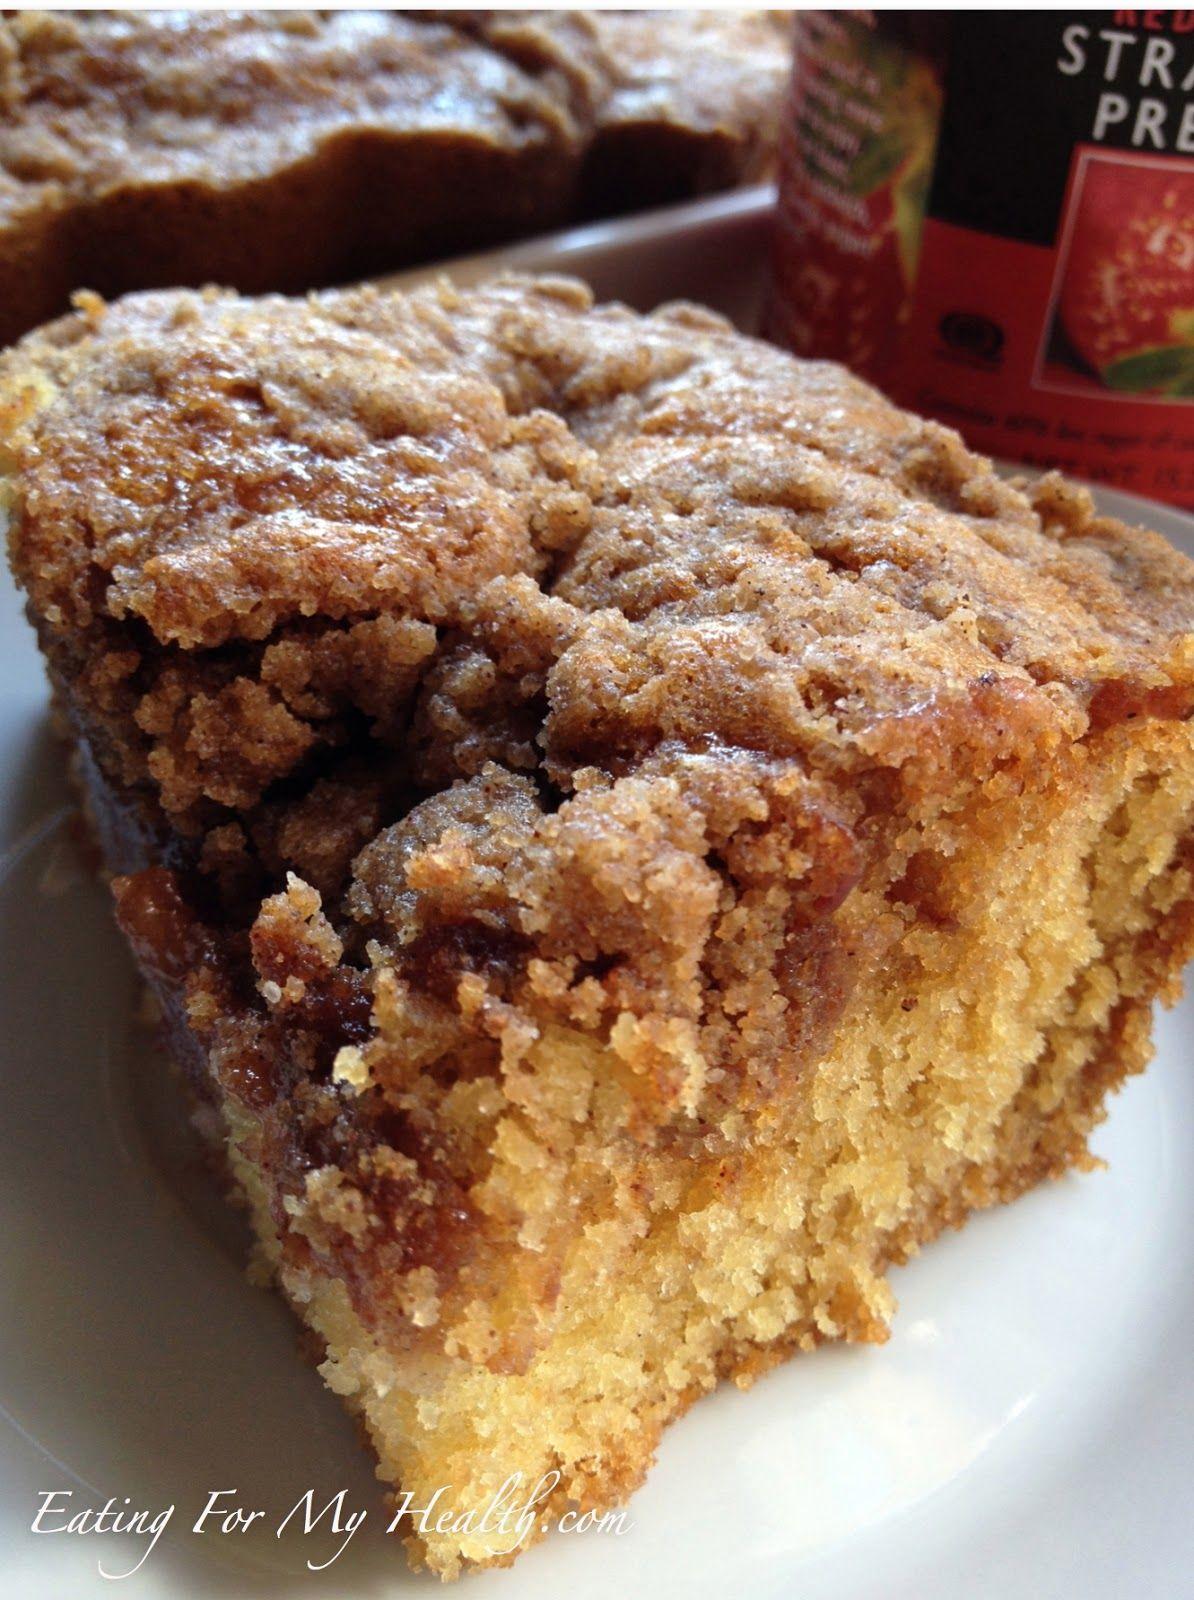 Gluten free strawberry crumb cake picnic cake allergy